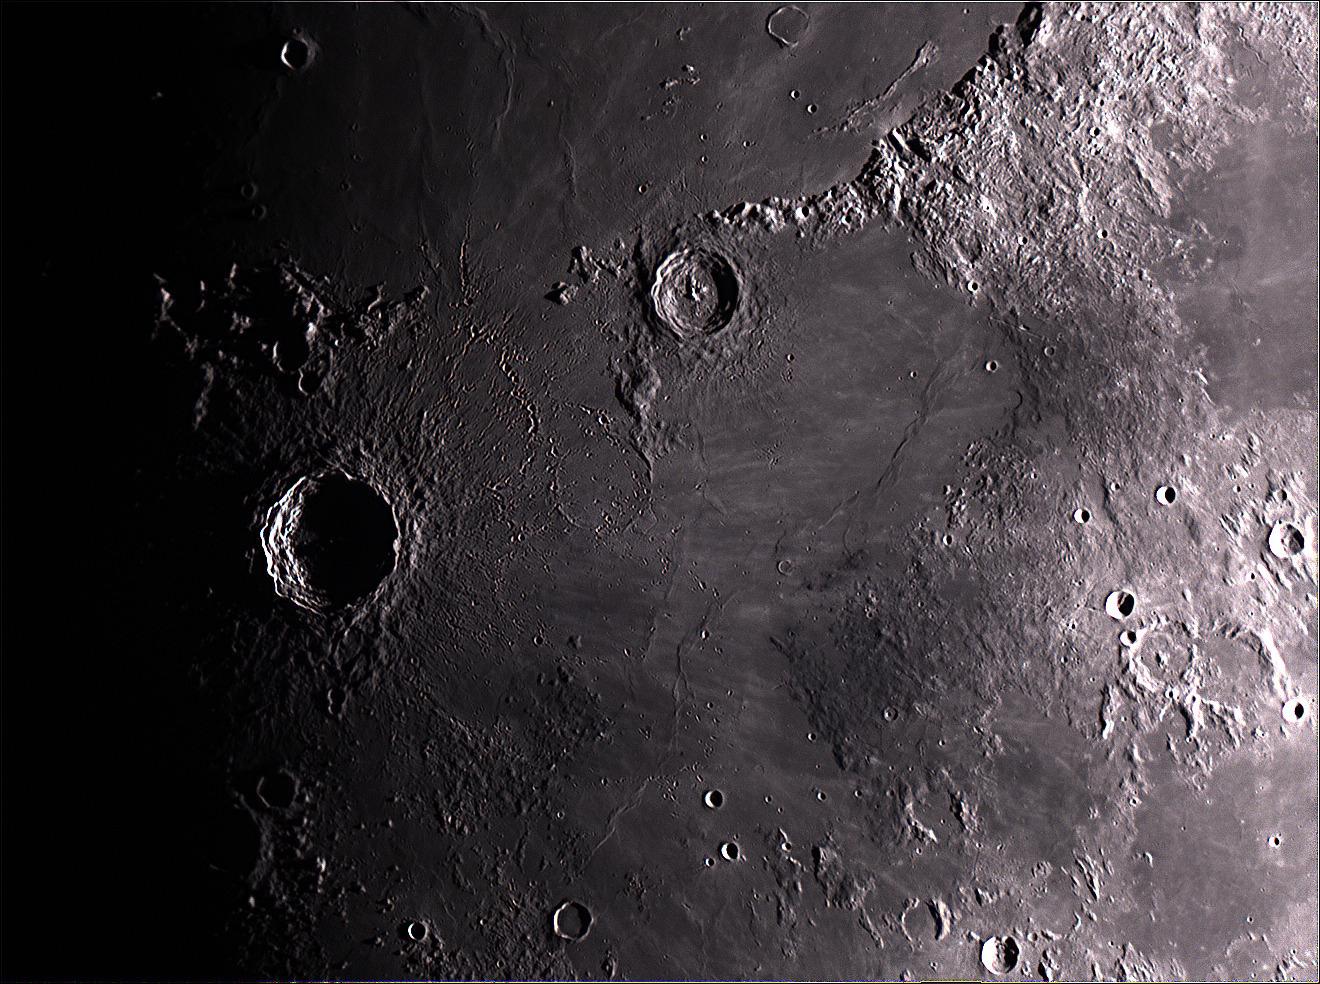 Moon_211047_g4_ap2183.jpg.723859d5b79a59c849893f1165f9f842.jpg